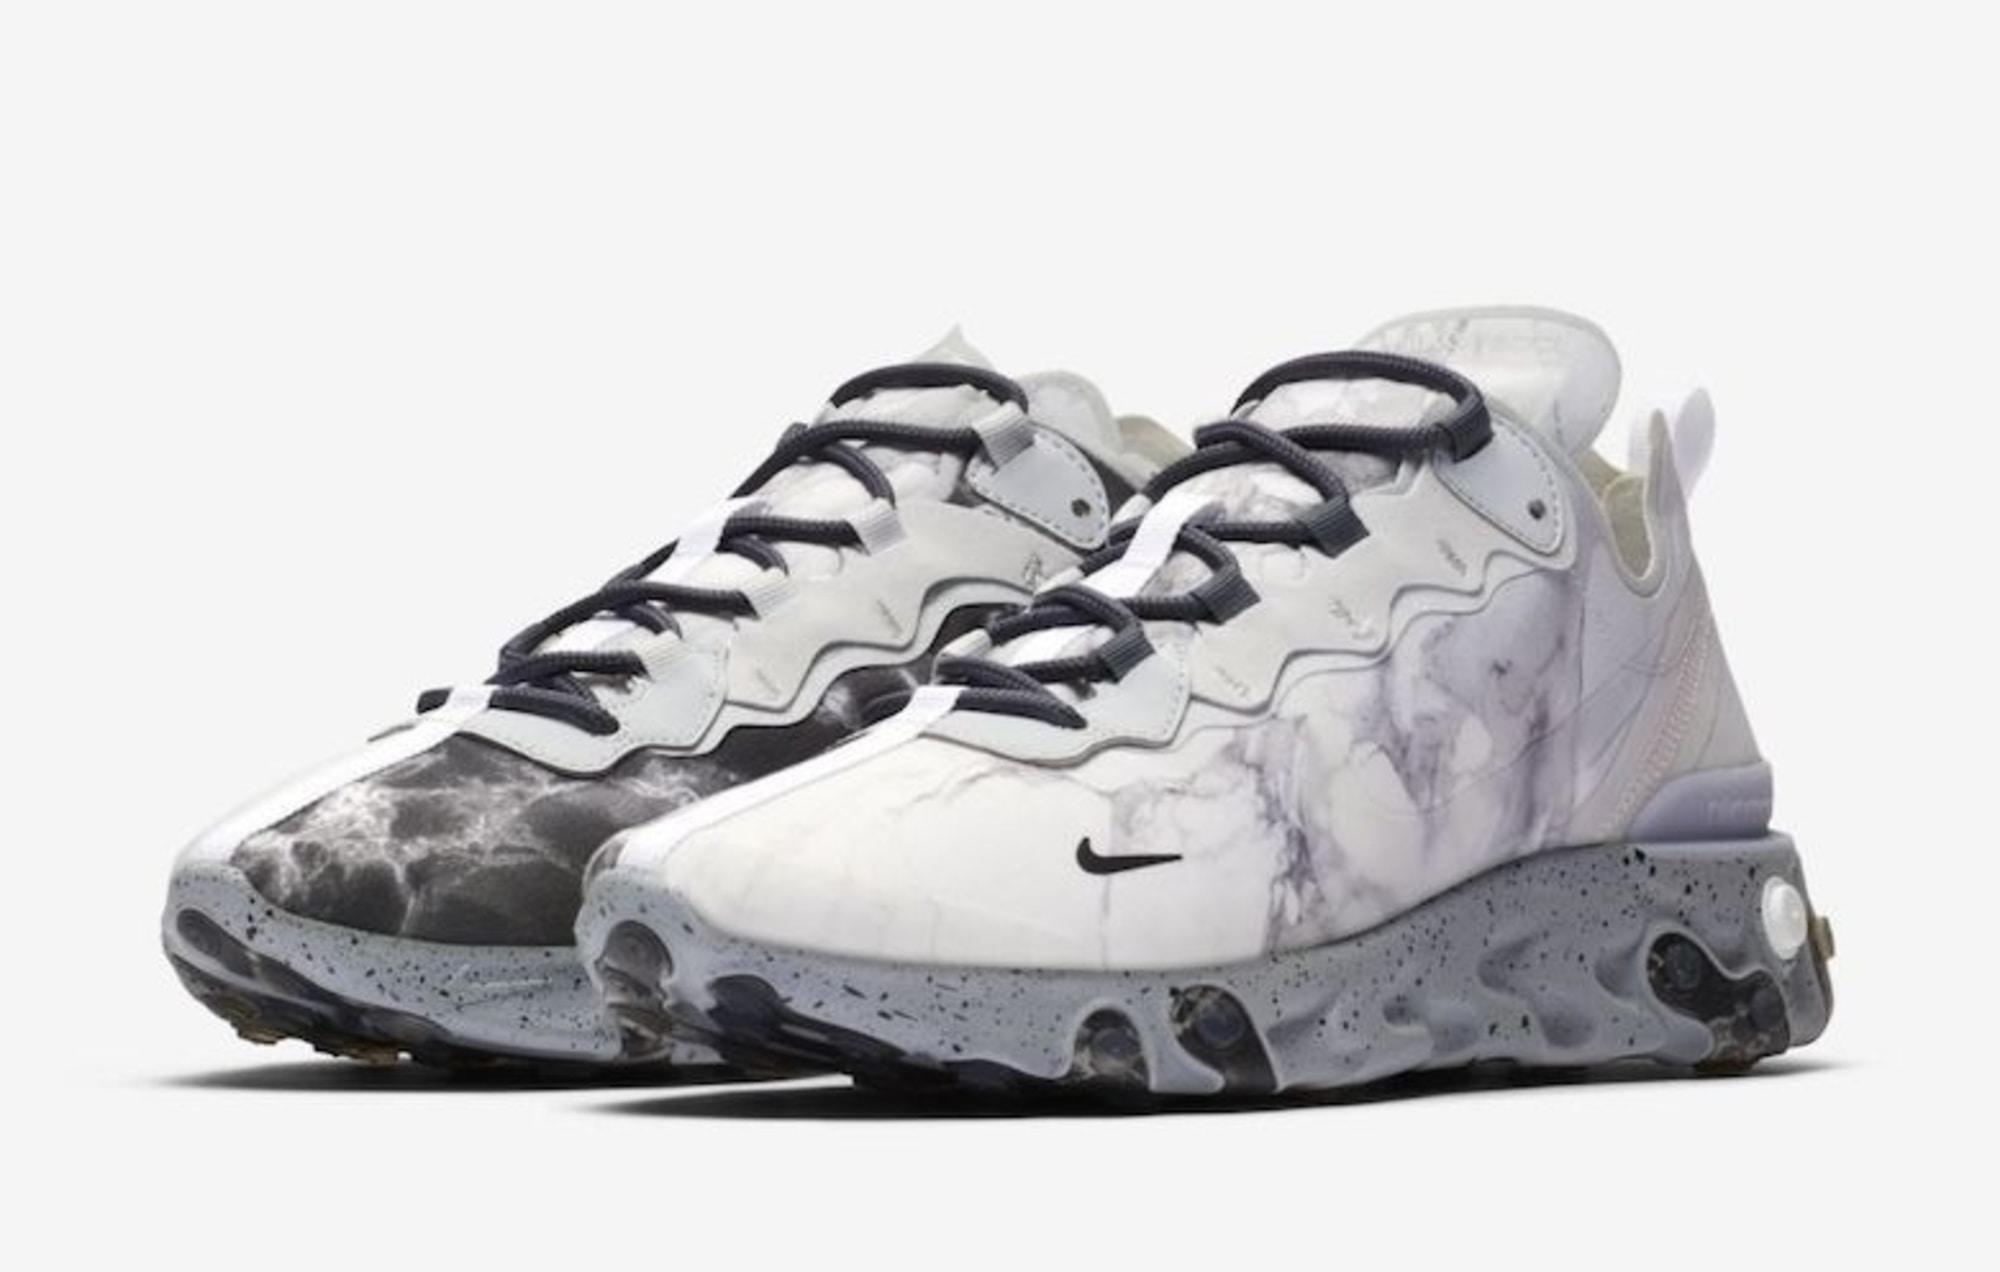 Kendrick Lamar's new Nike collaboration